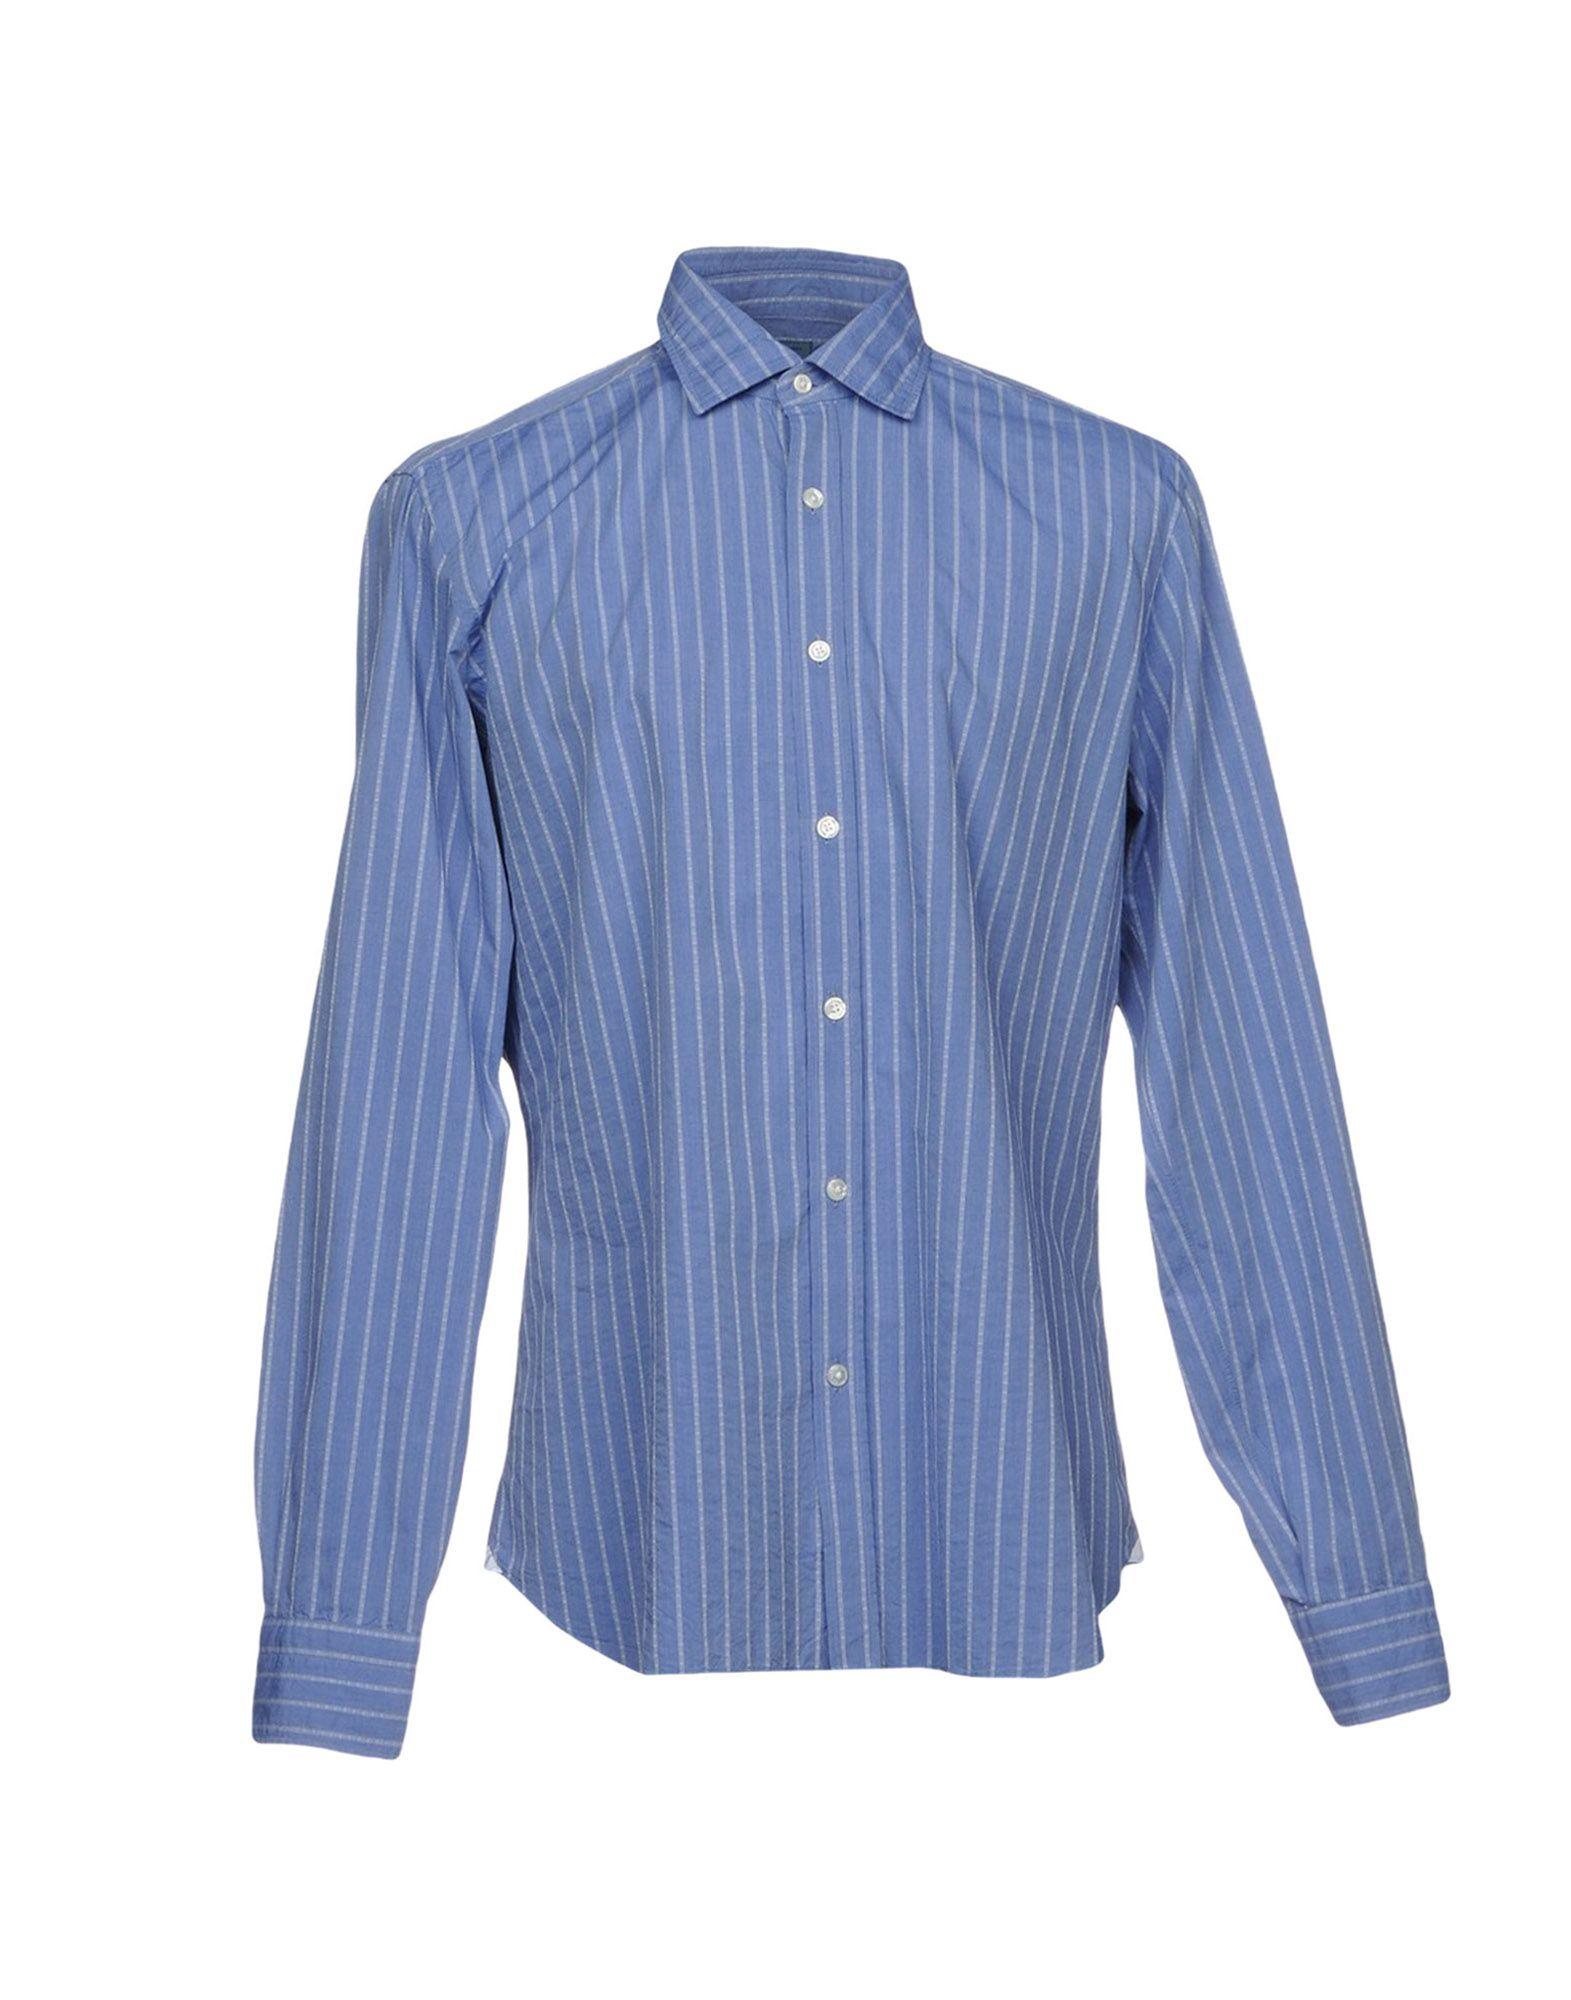 BARBA Napoli Herren Hemd Farbe Azurblau Größe 7 - broschei